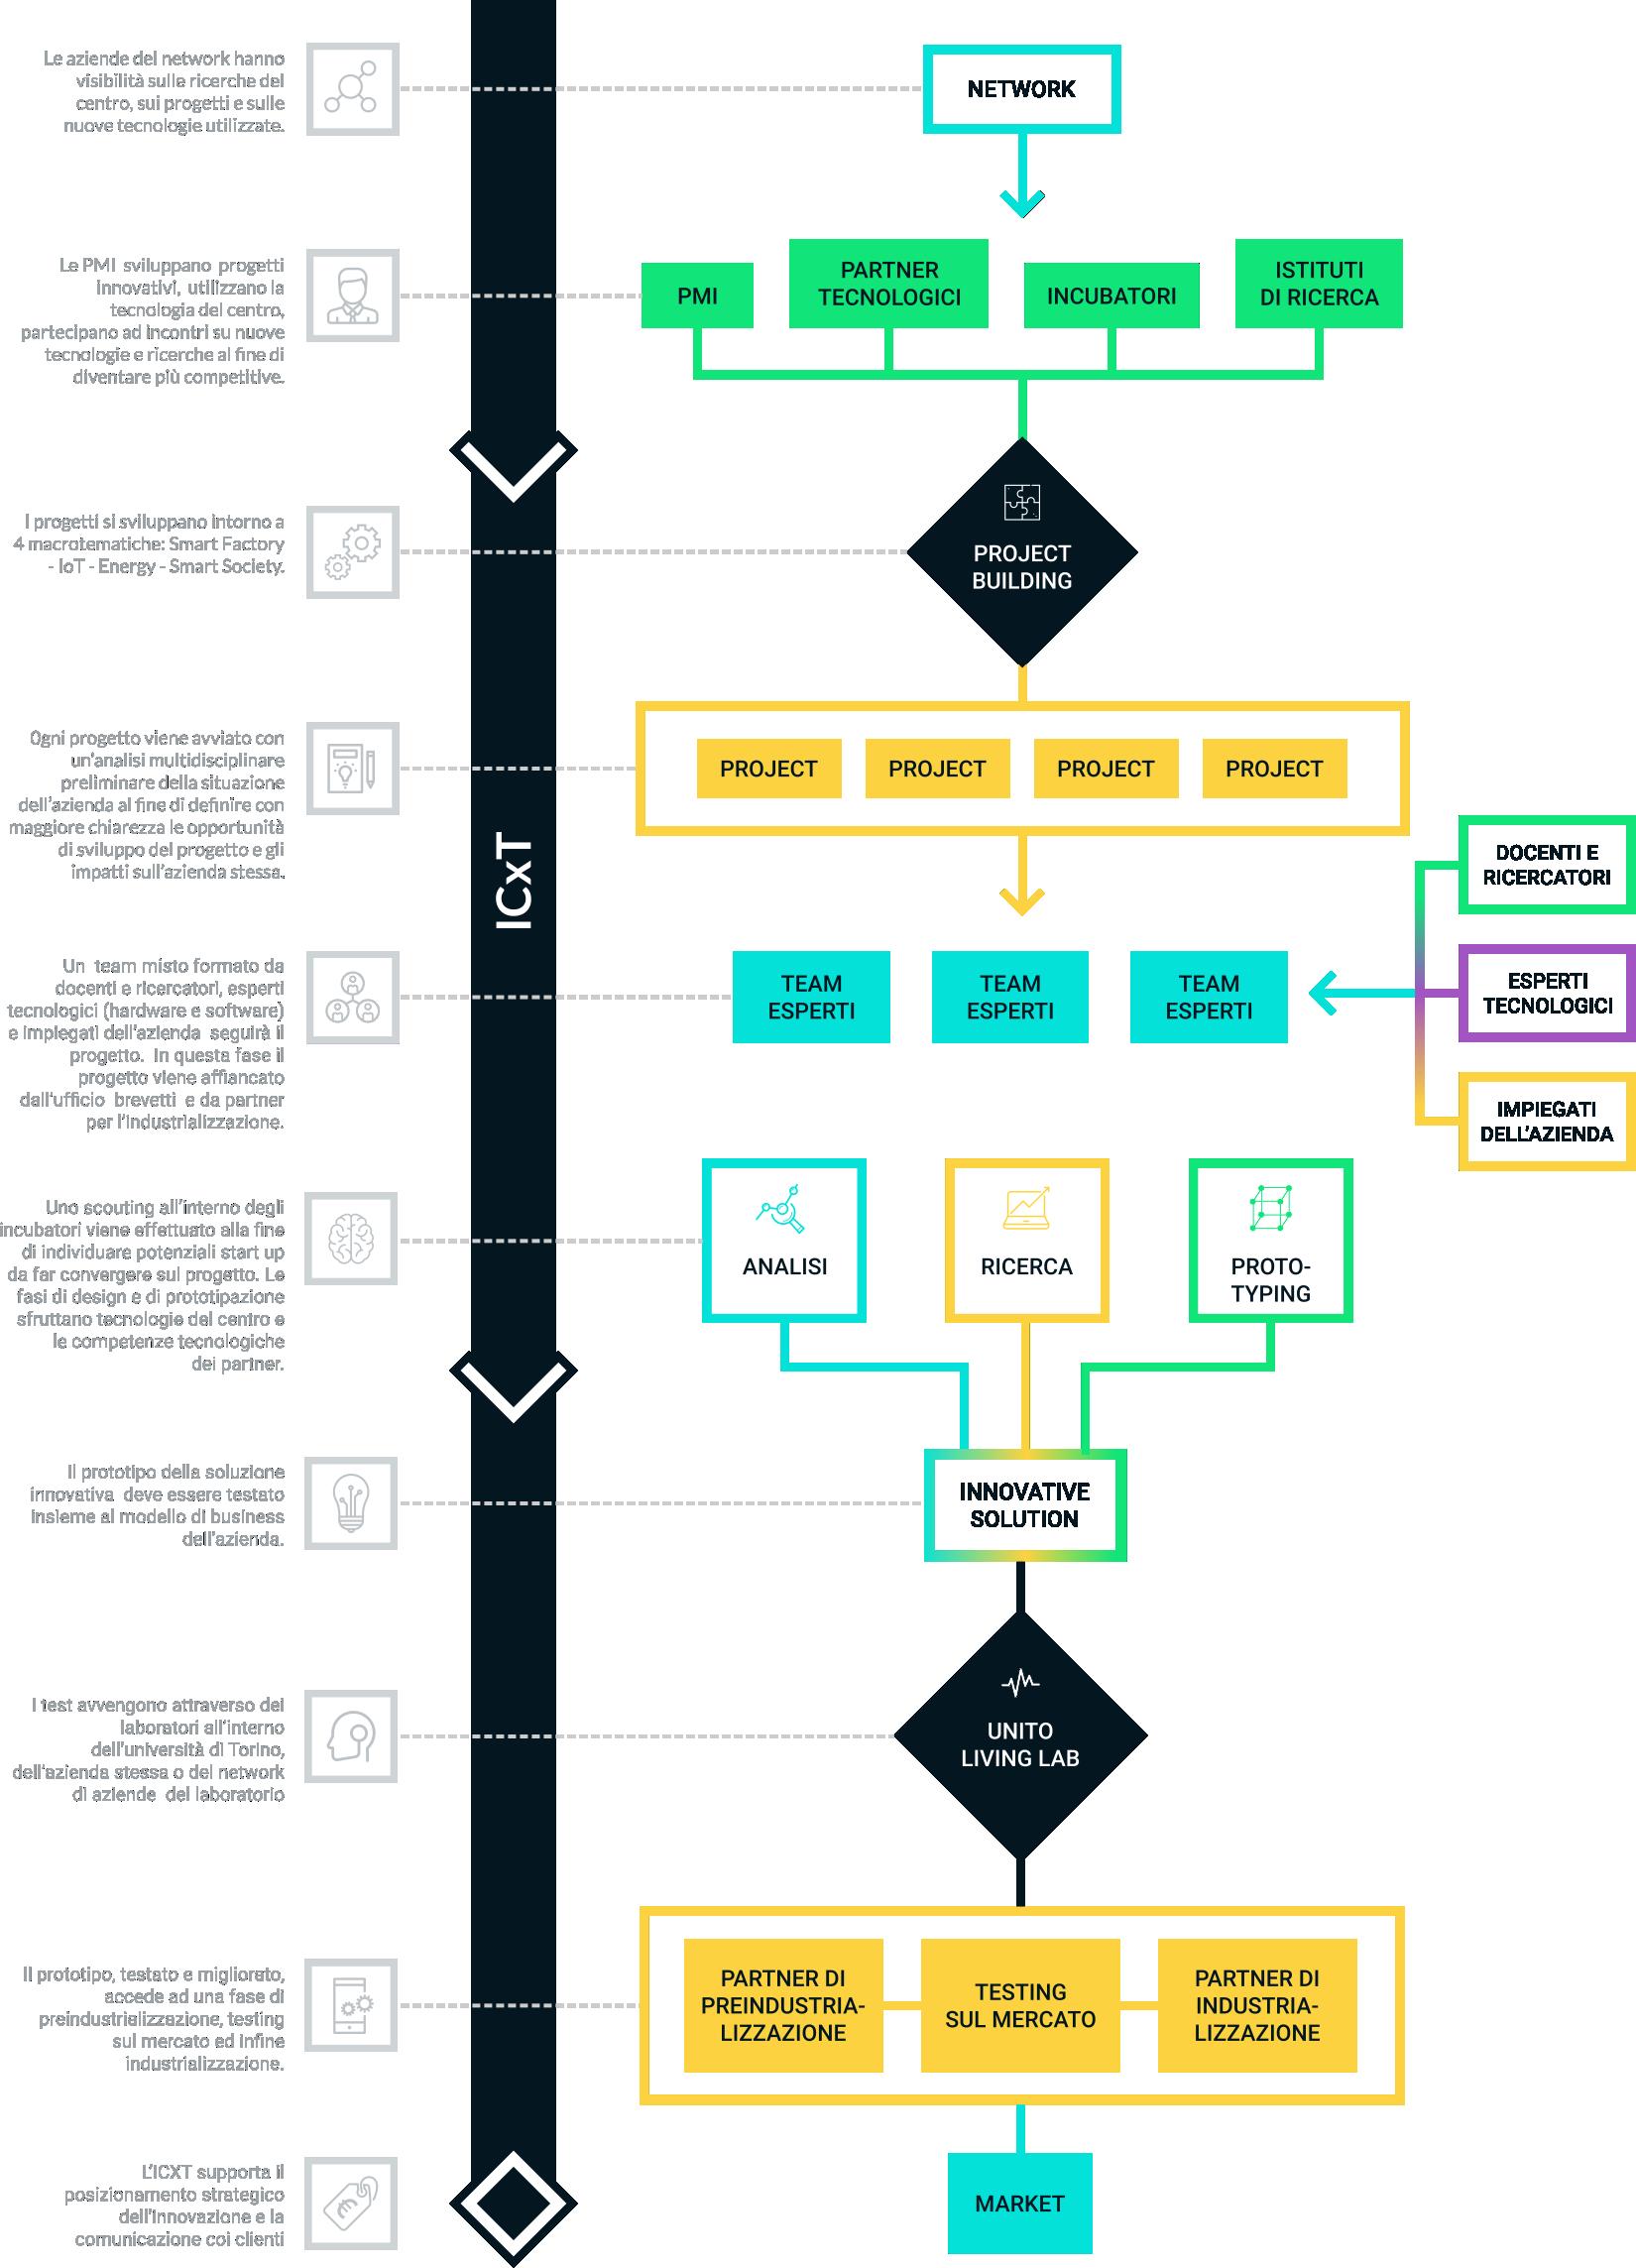 immagine riassuntiva del metodo icxt